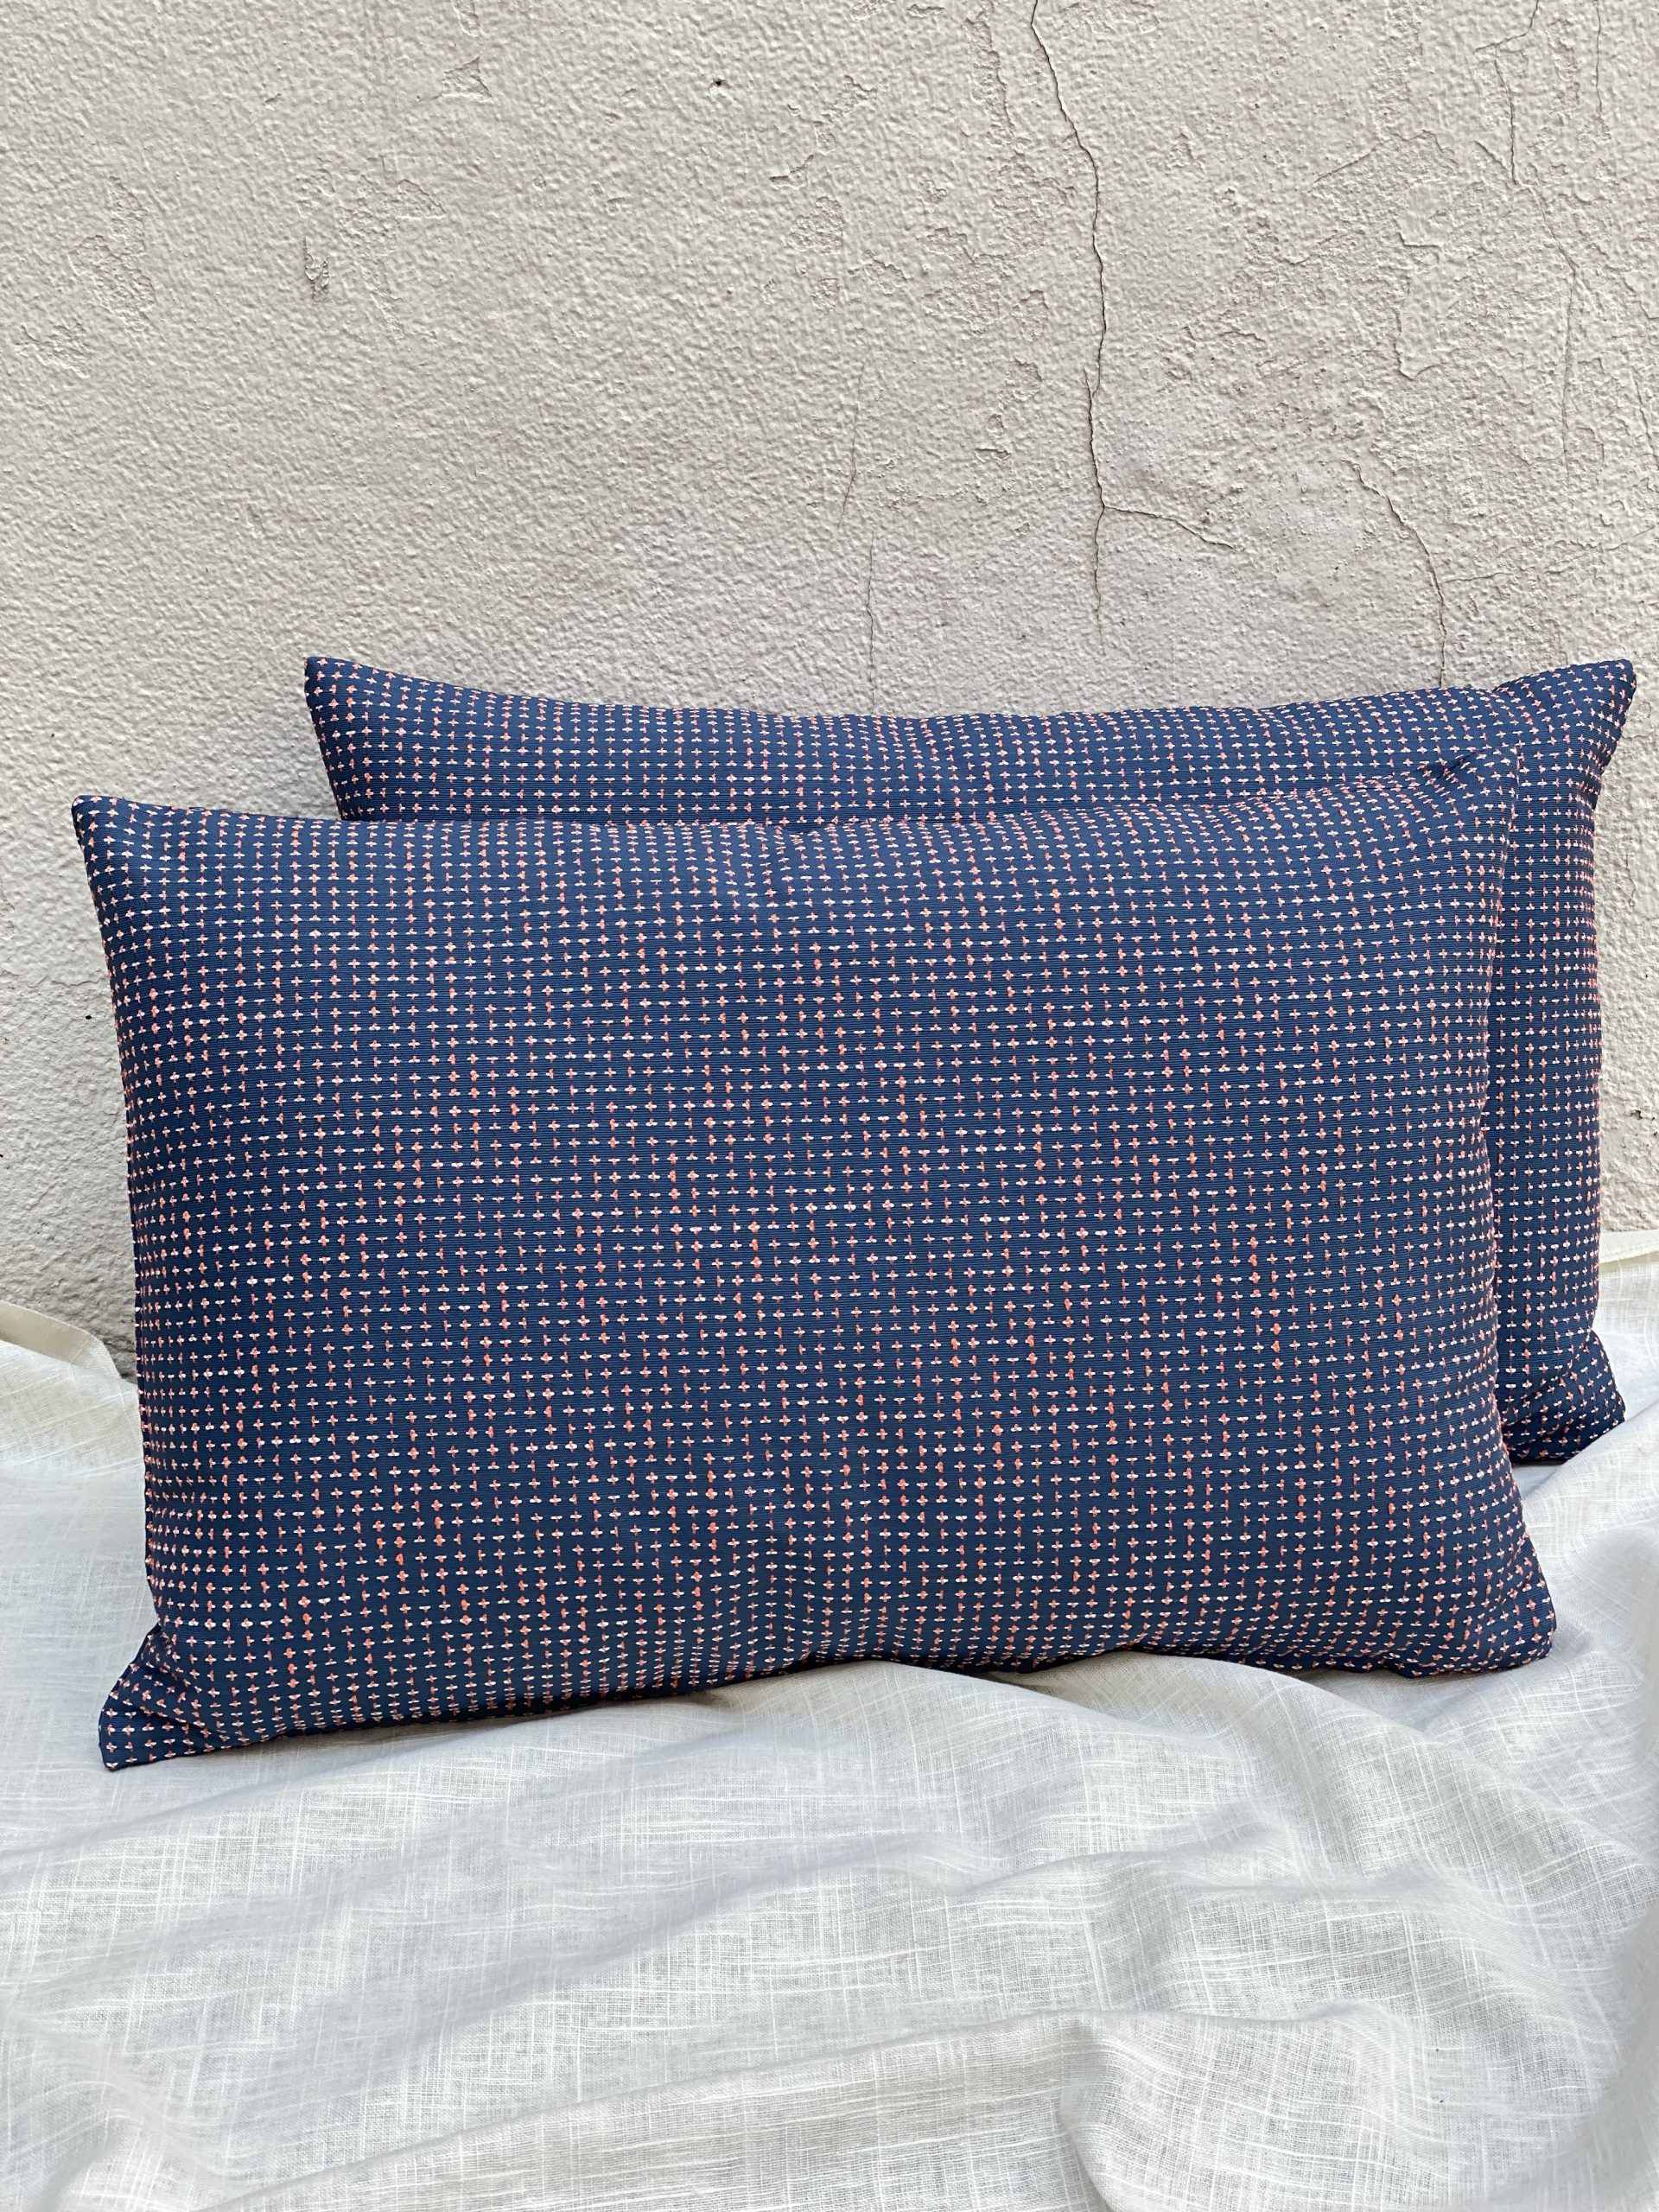 Outdoor Rectangular Pillows